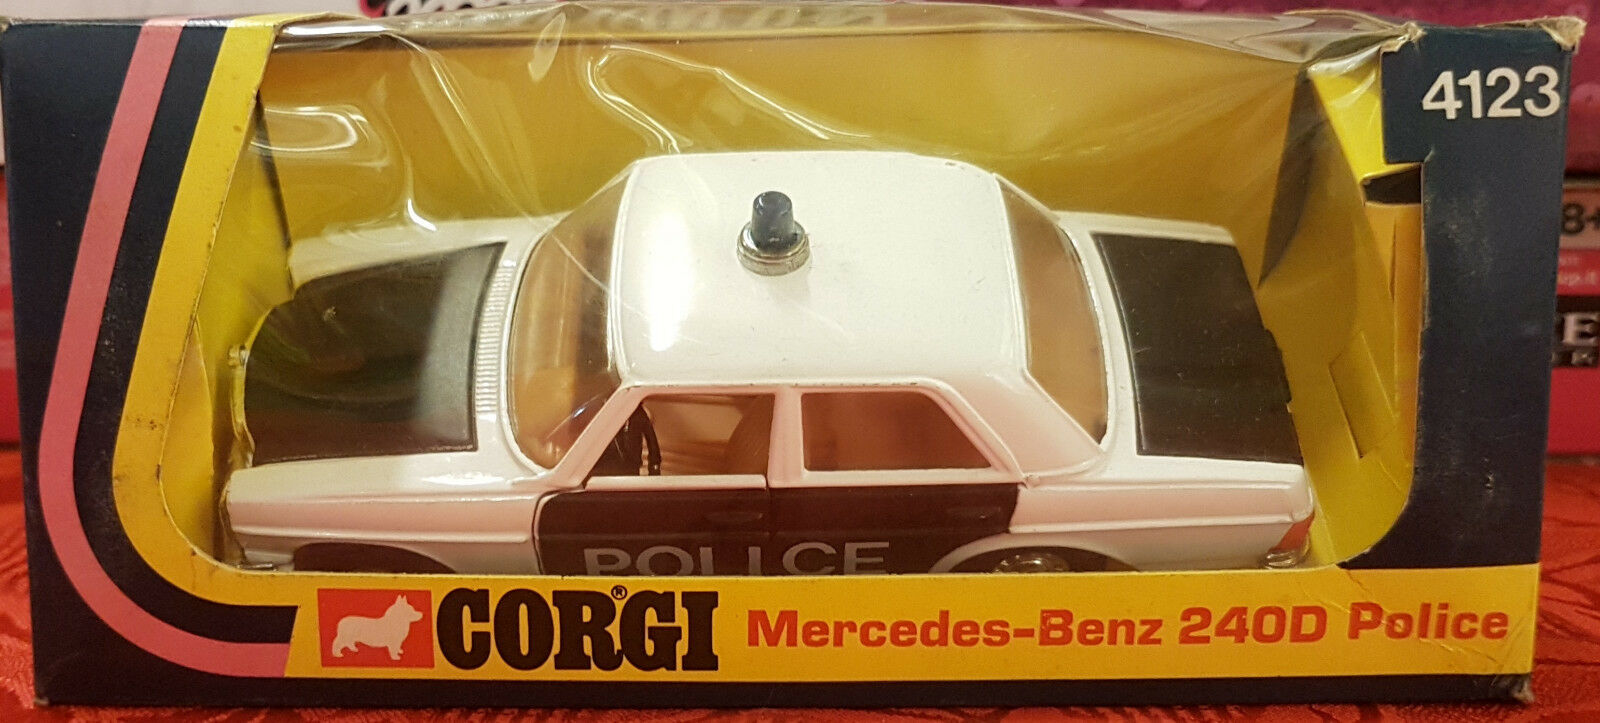 CORGI - Mercedes-Benz 240D Police (1975) - 4123 - MADE IN GREAT BRITAIN